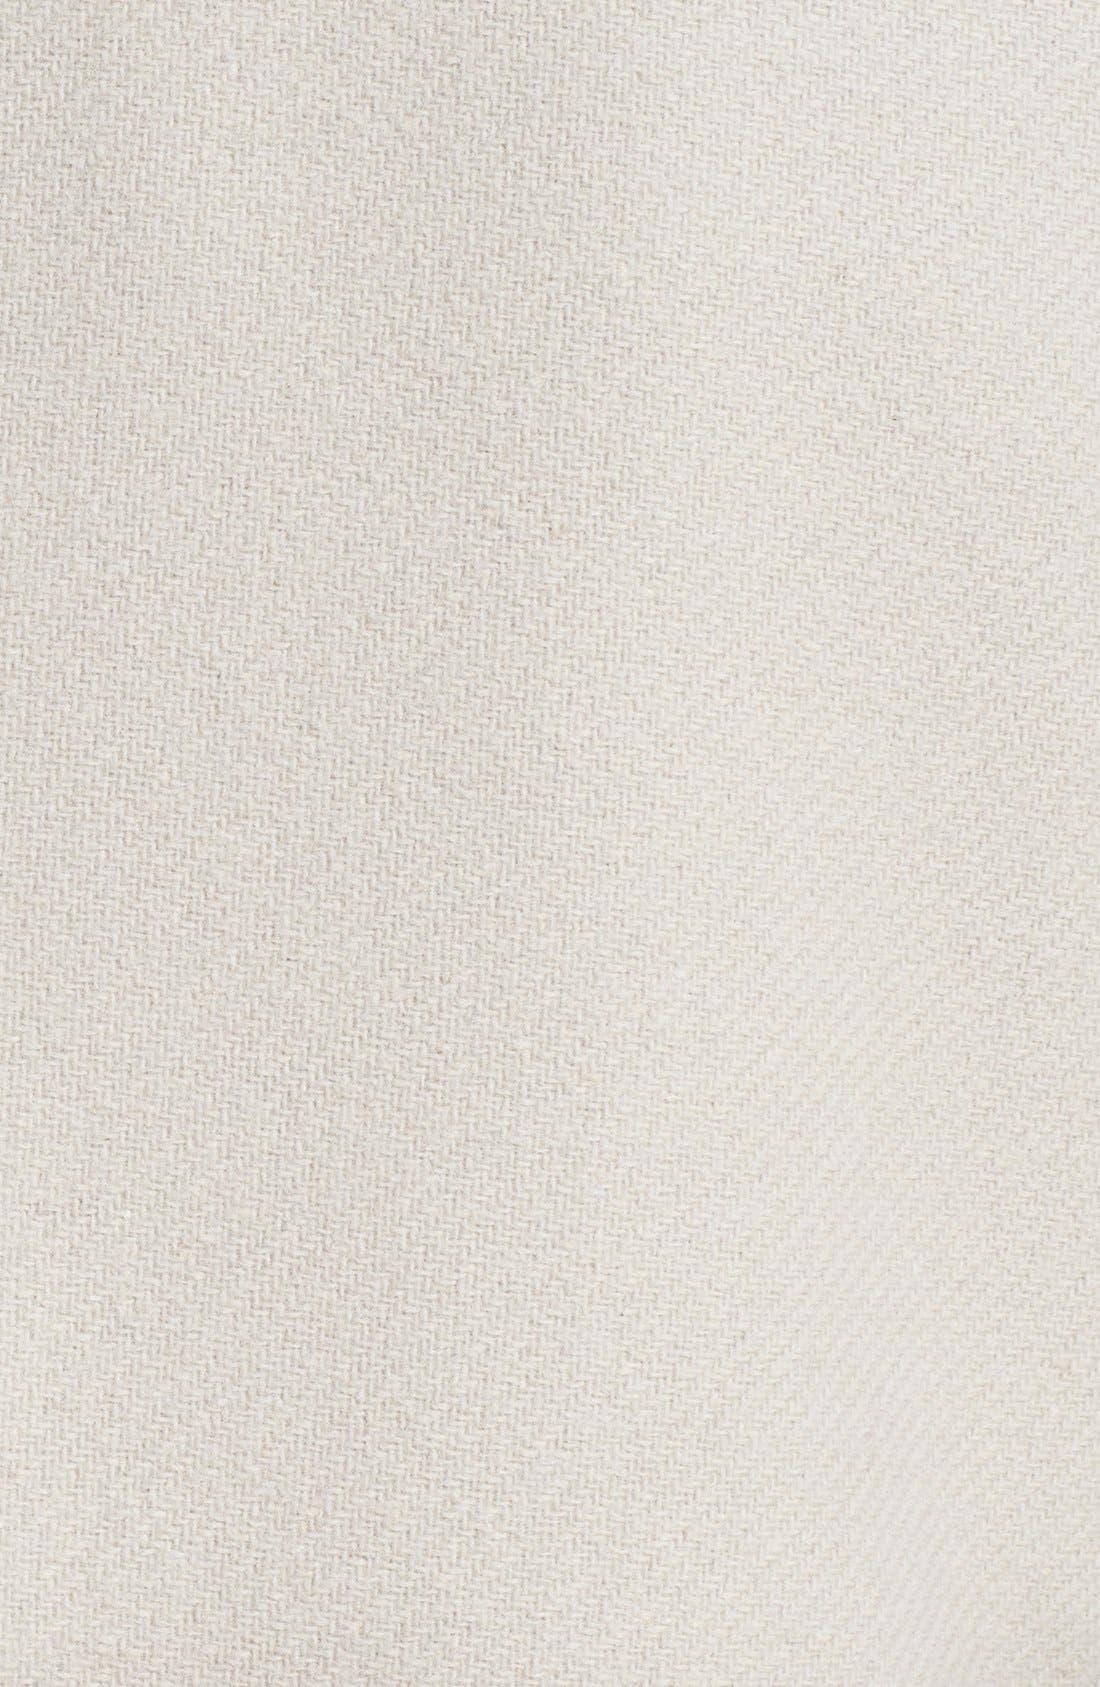 Alternate Image 3  - Burberry Brit 'Charlestead' Wool Blend Coat